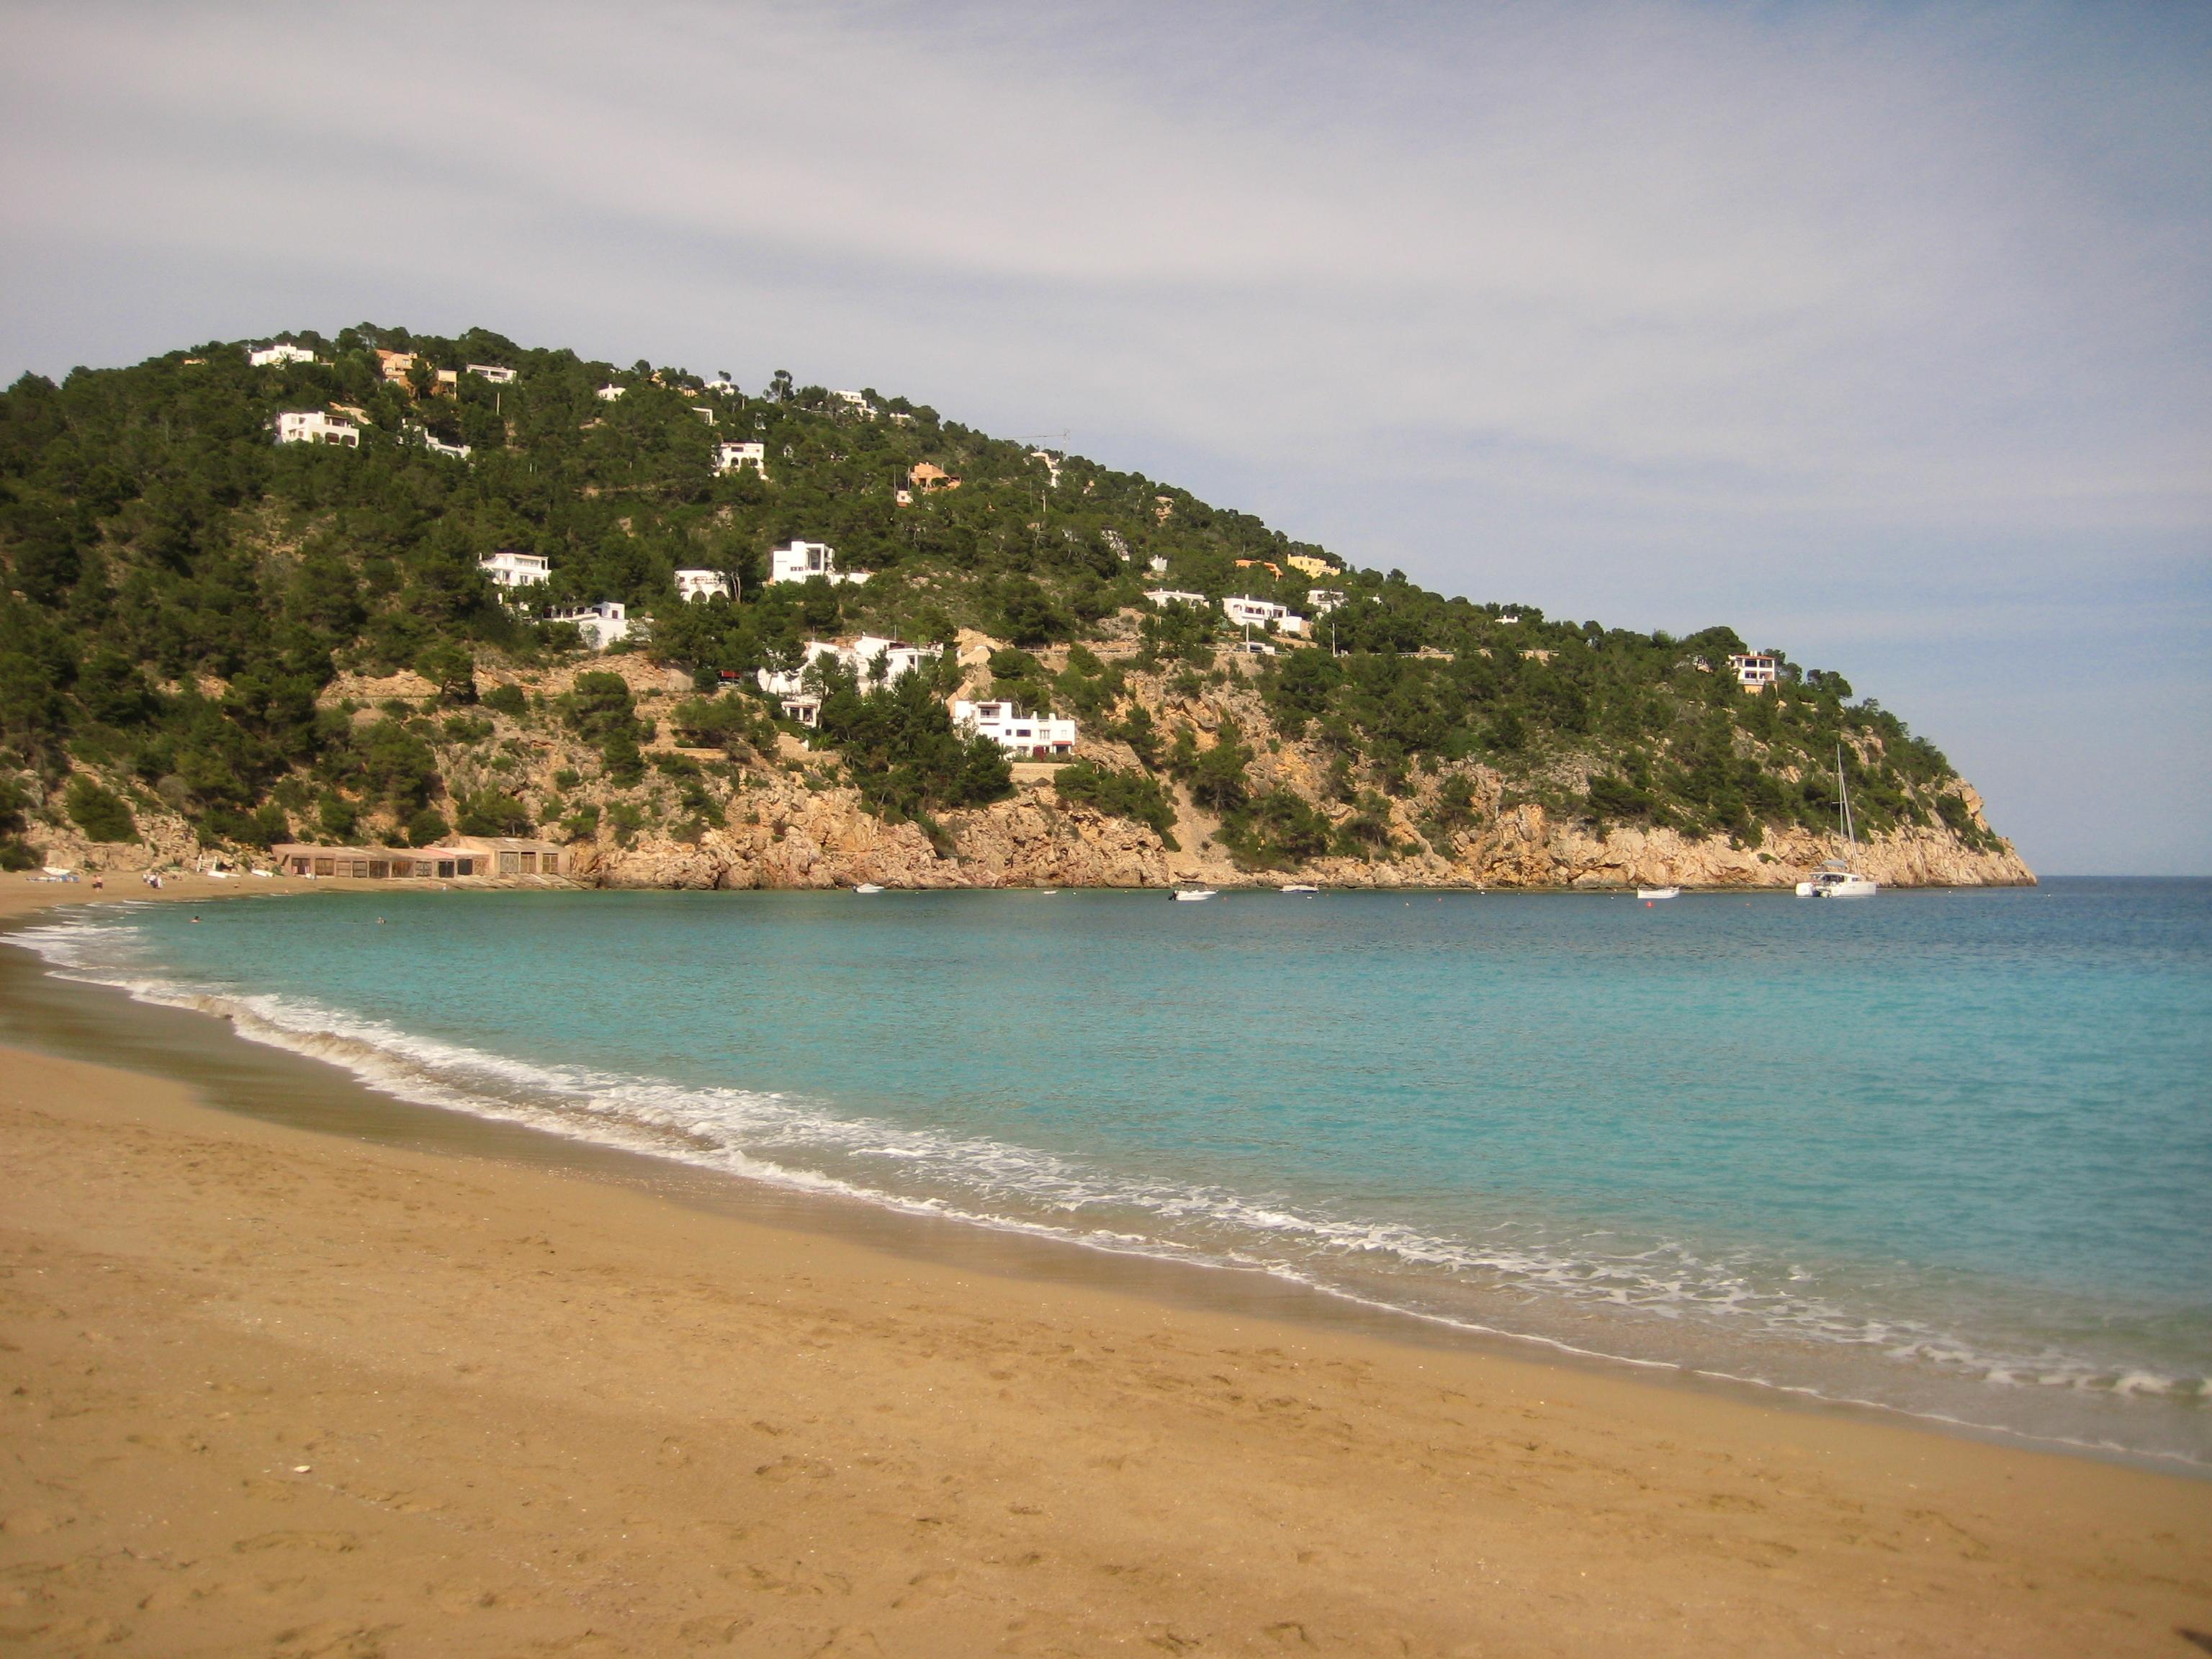 Calla Valeda, une plage magnifique à Ibiza